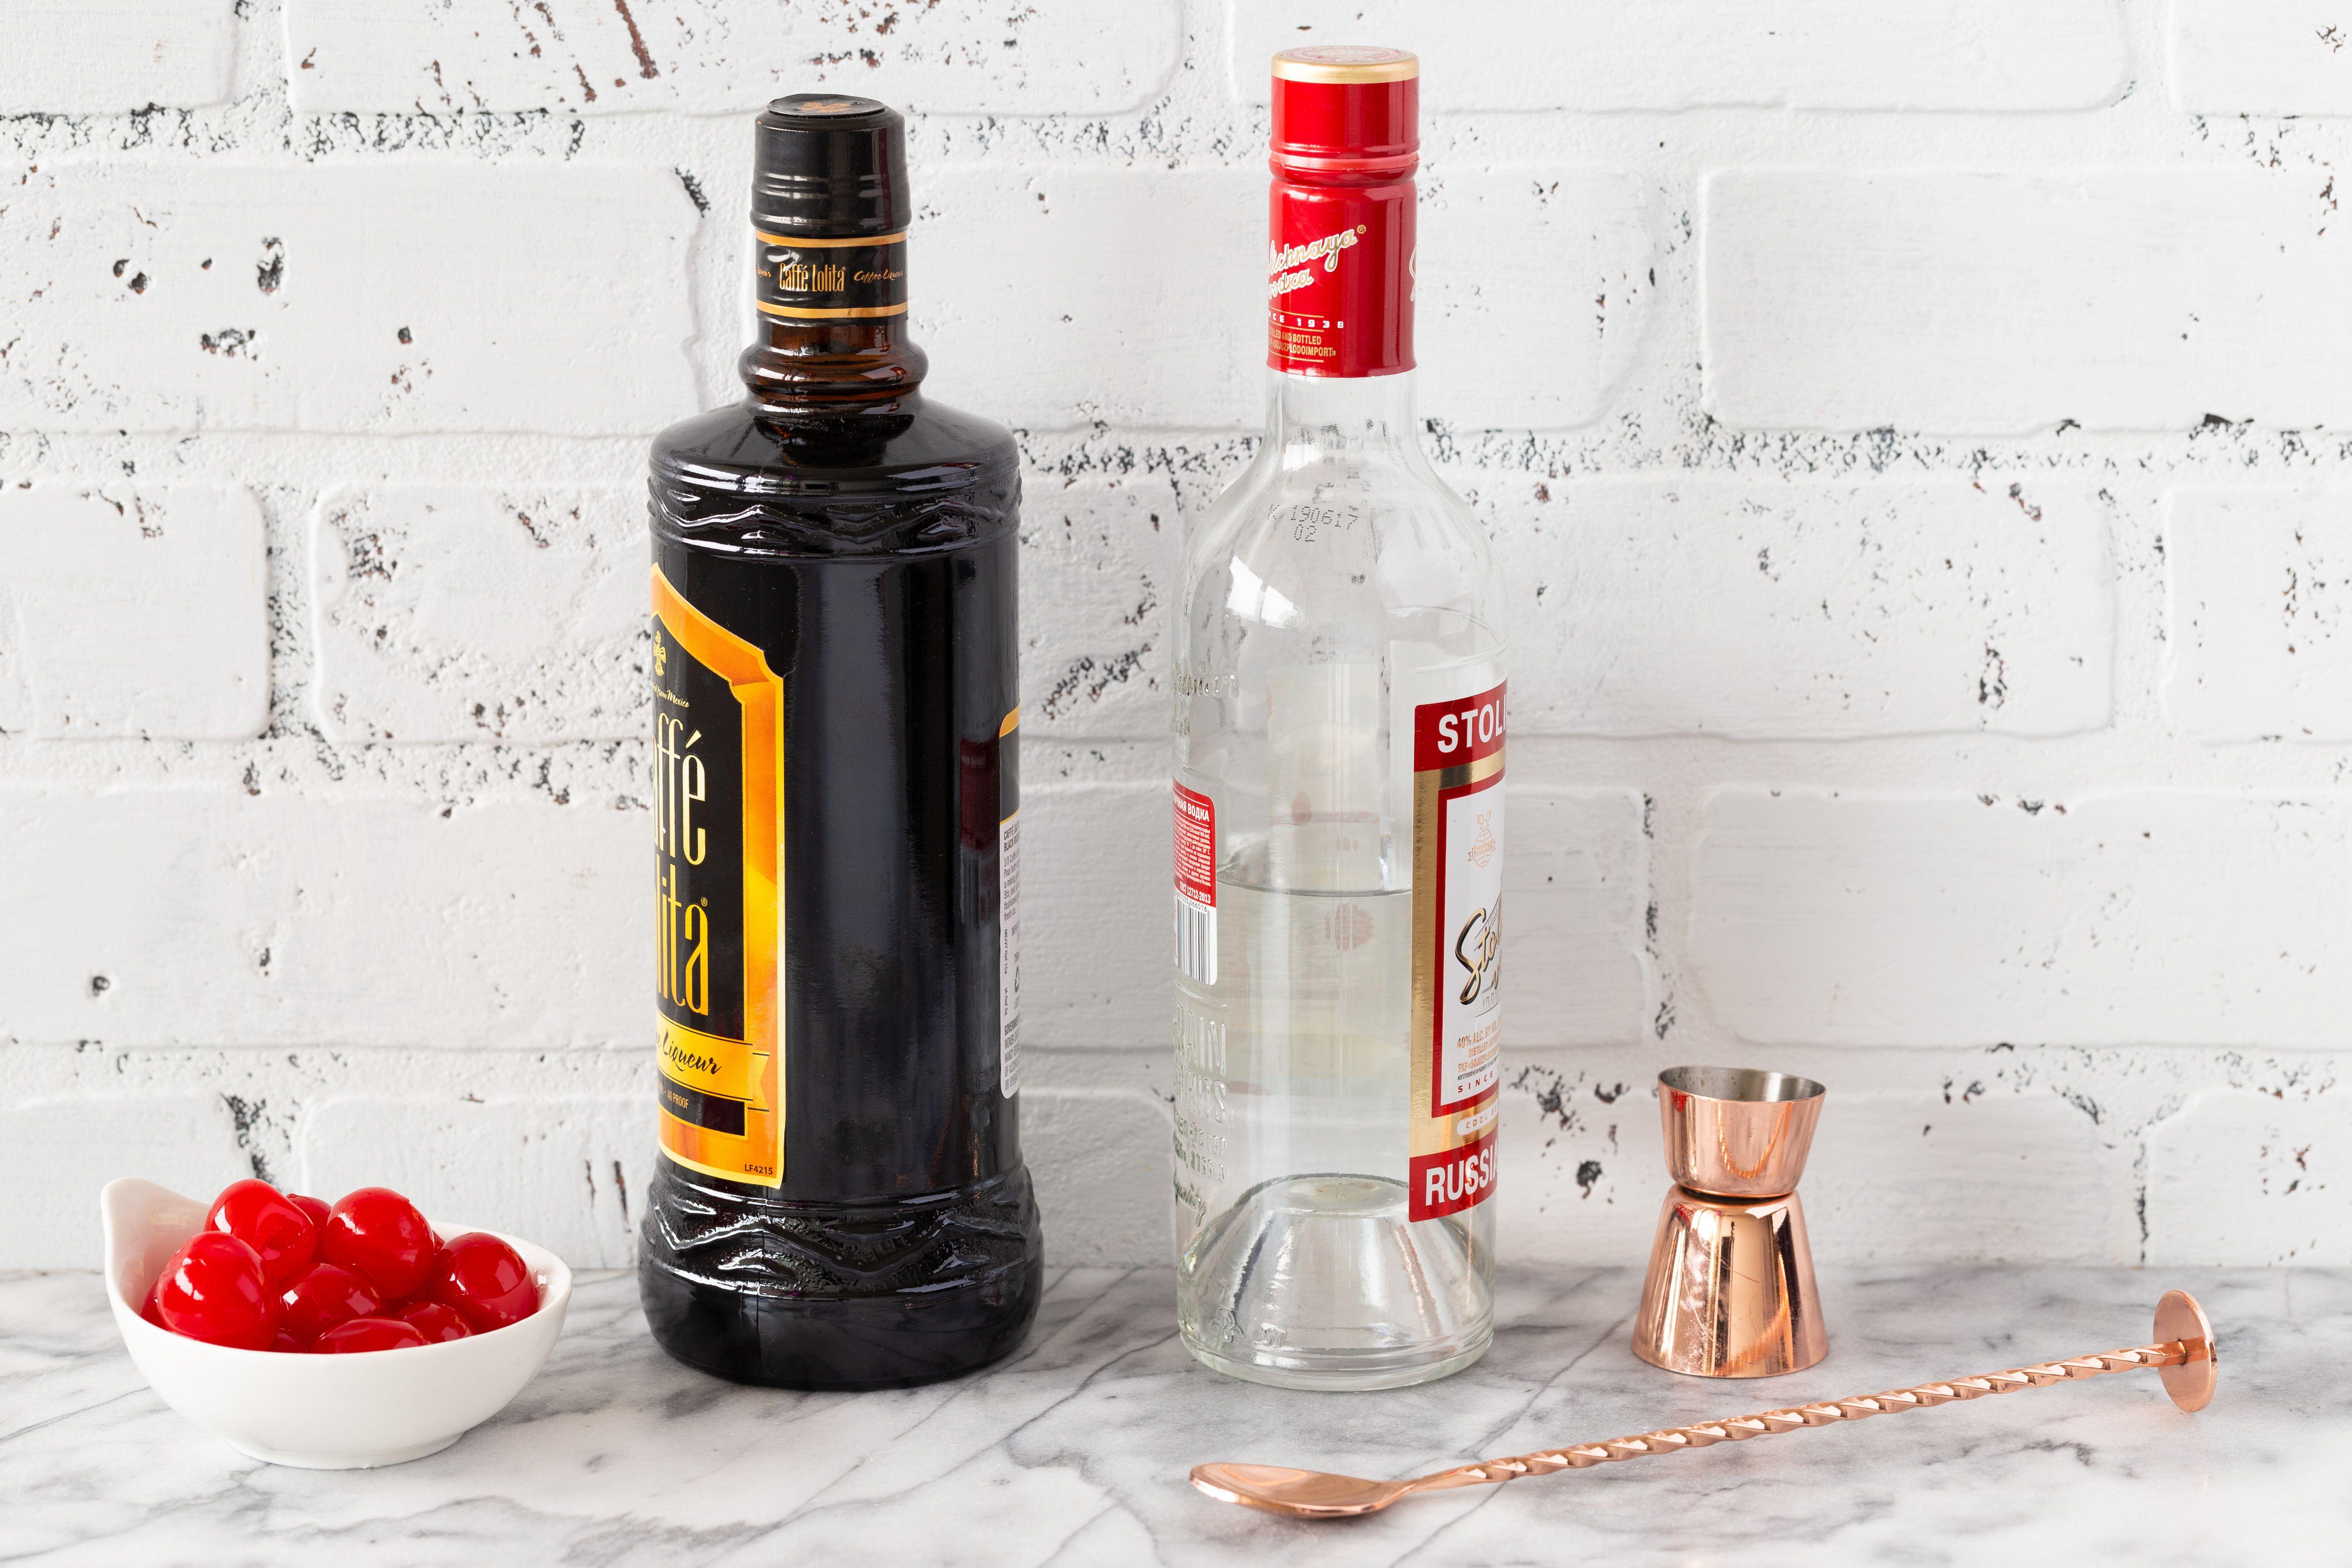 Black Russian recipe ingredients